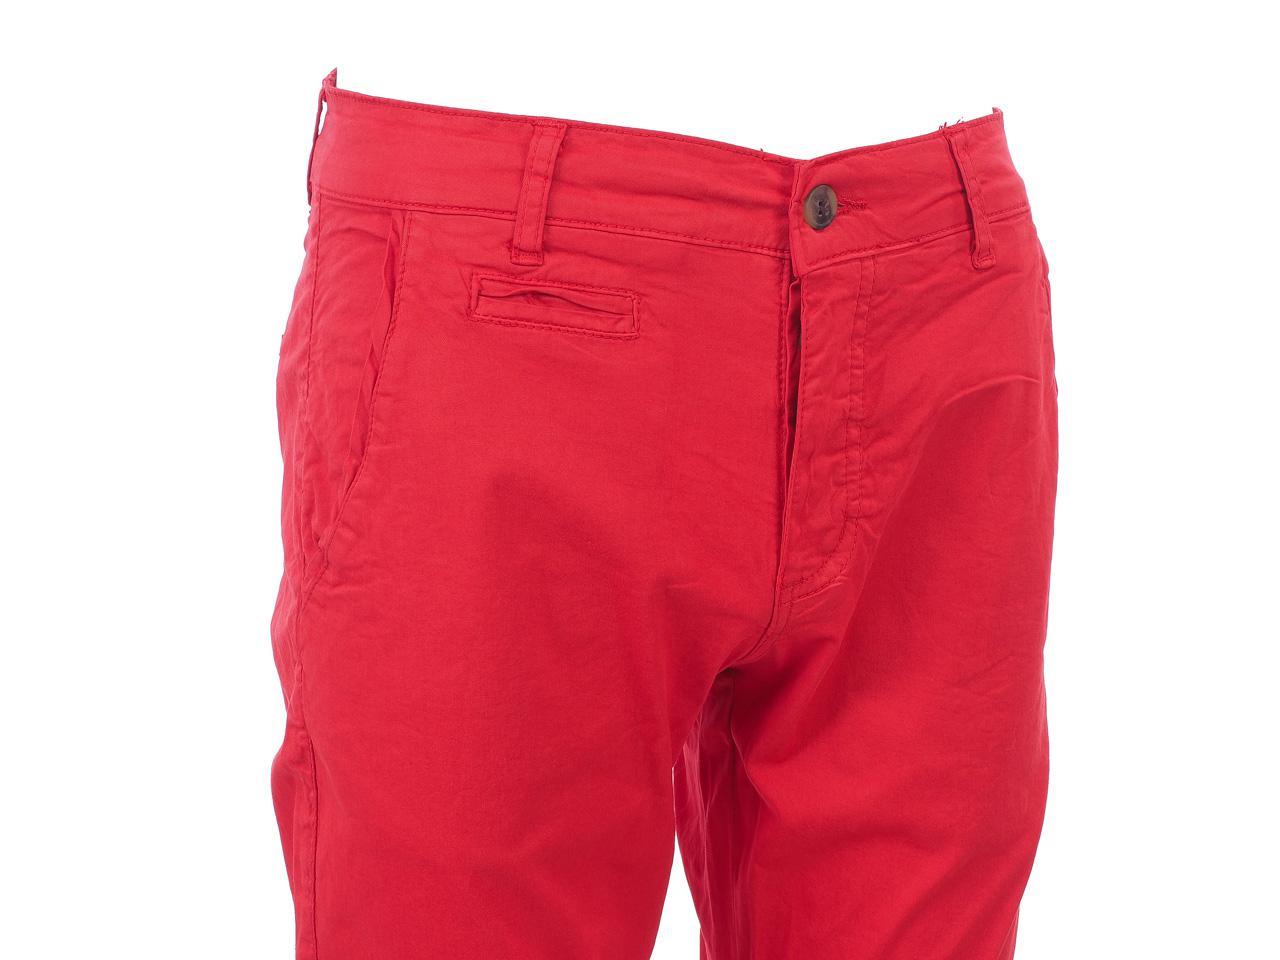 Hose-Biaggio-Tarel-Rot-Hose-Chino-Rot-22256-Neu Indexbild 2